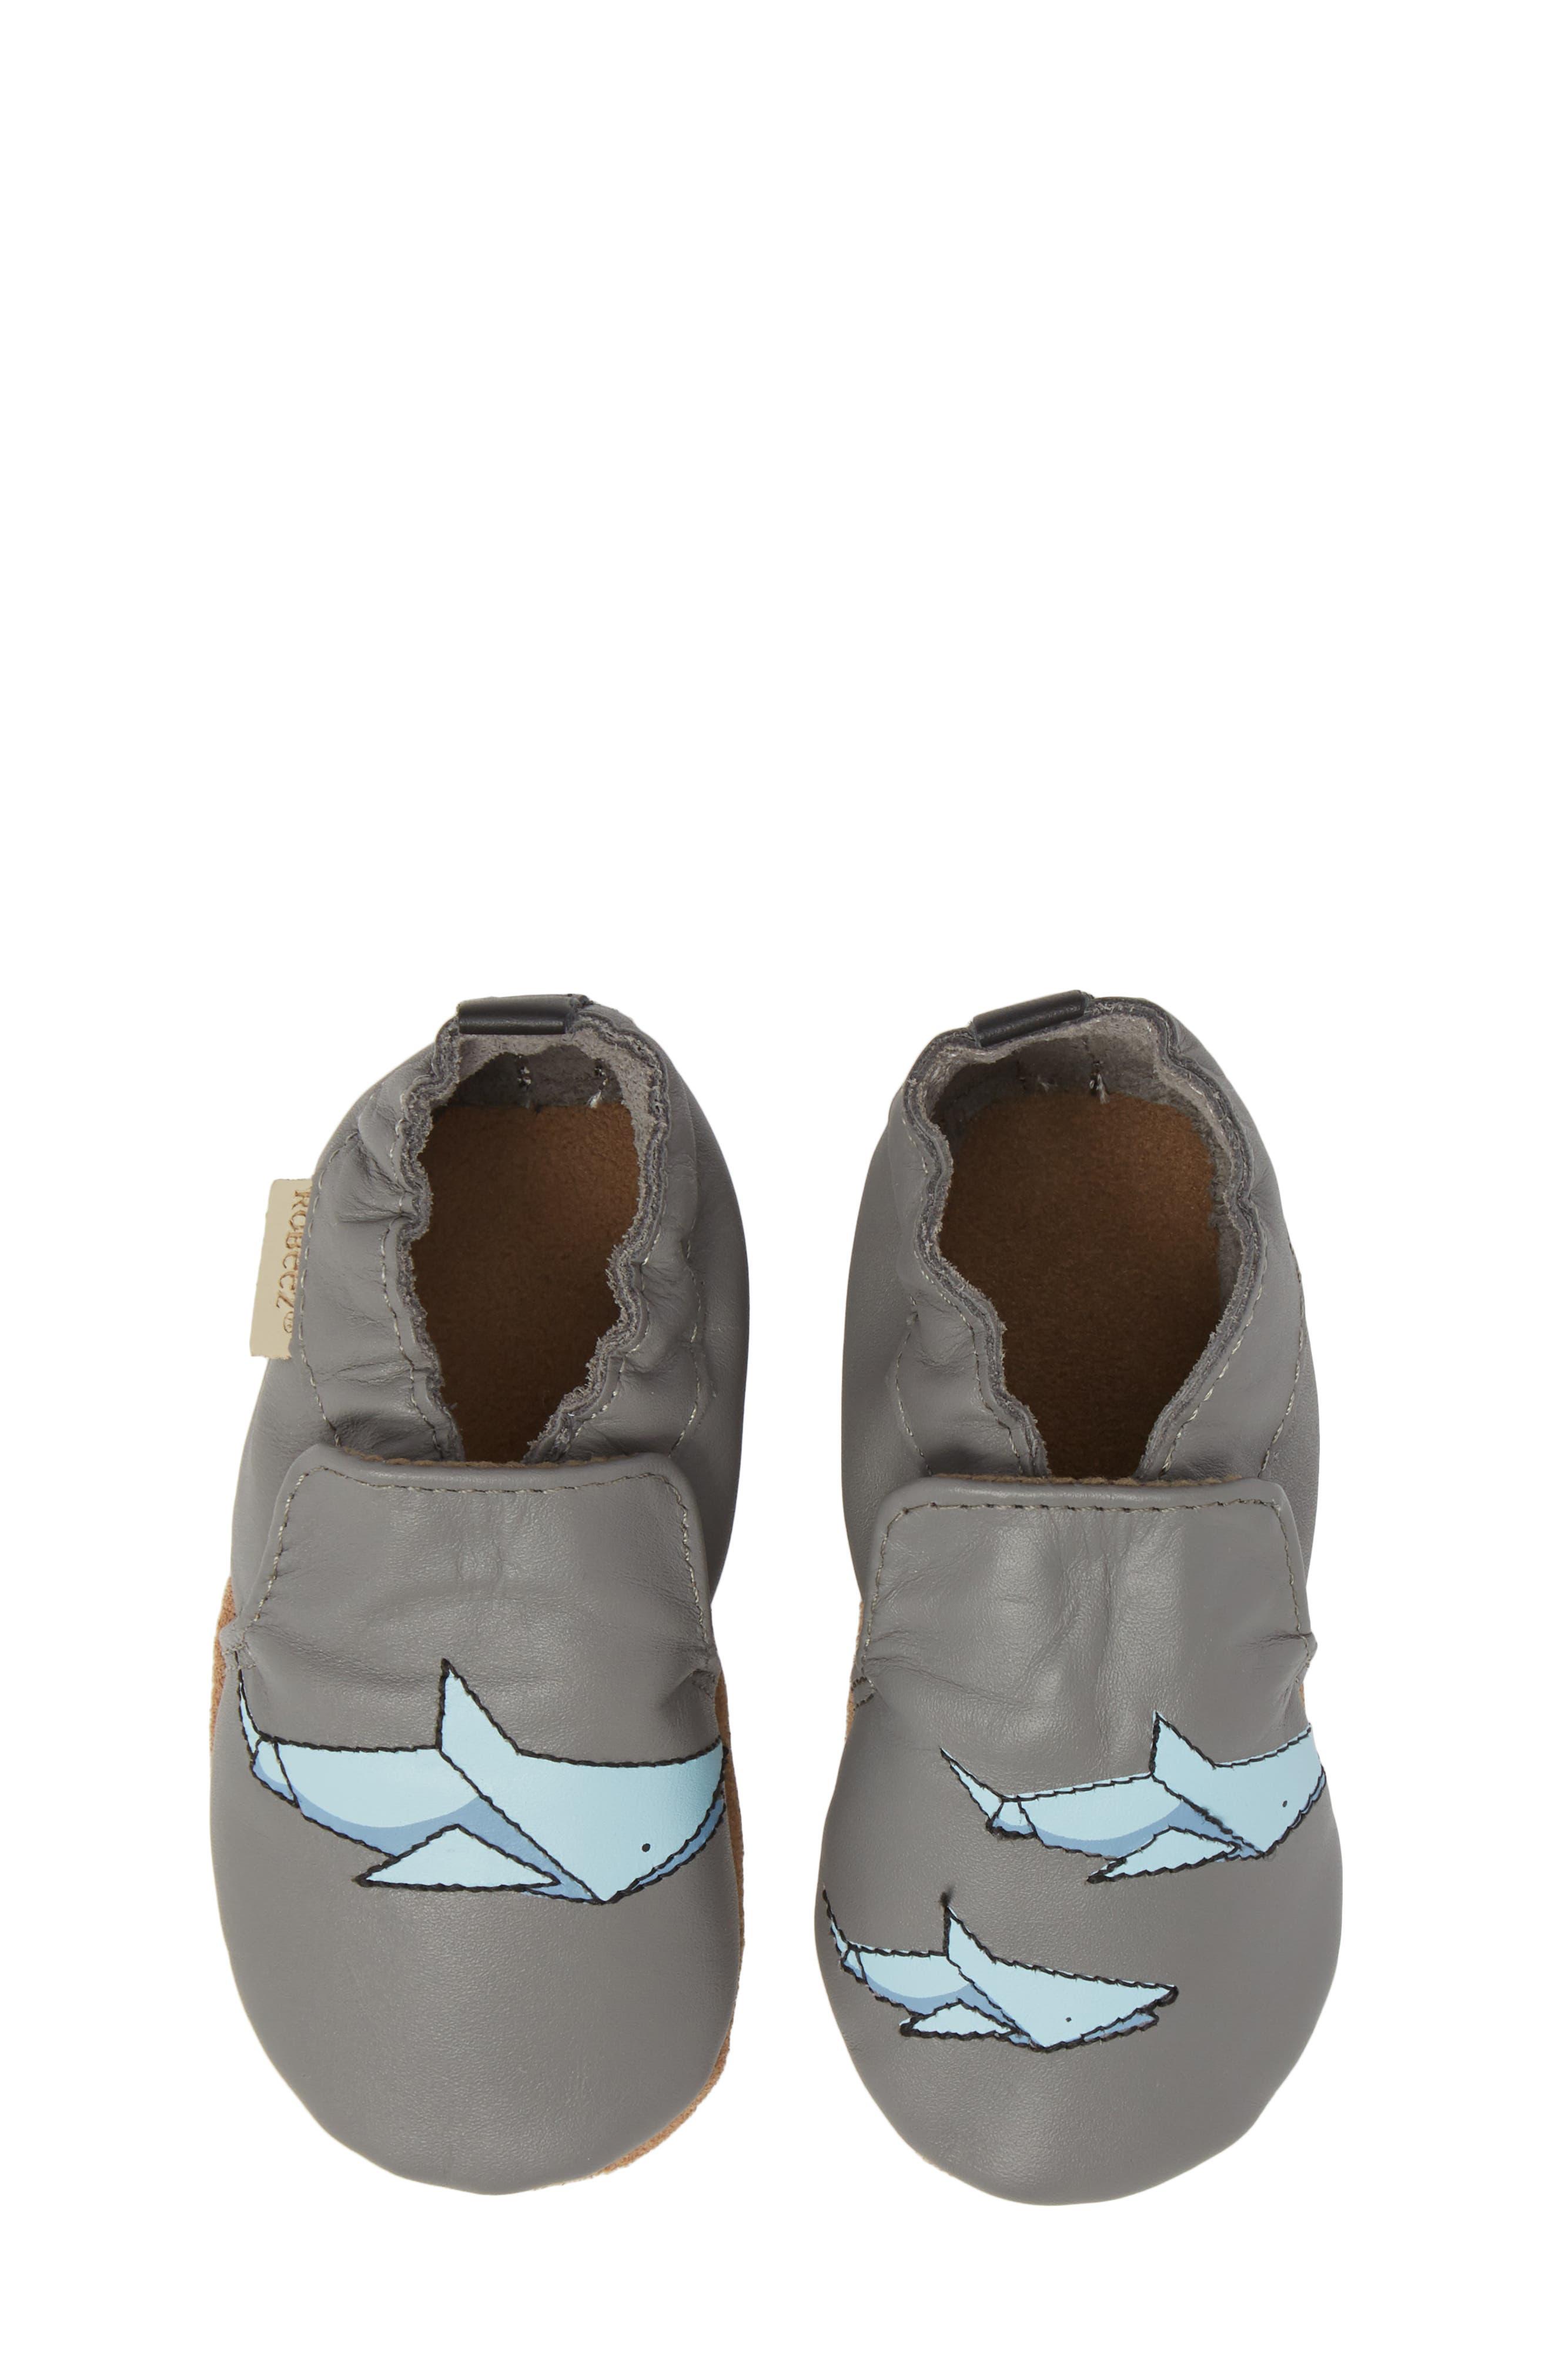 Sharktastic Moccasin Crib Shoe,                         Main,                         color, Grey